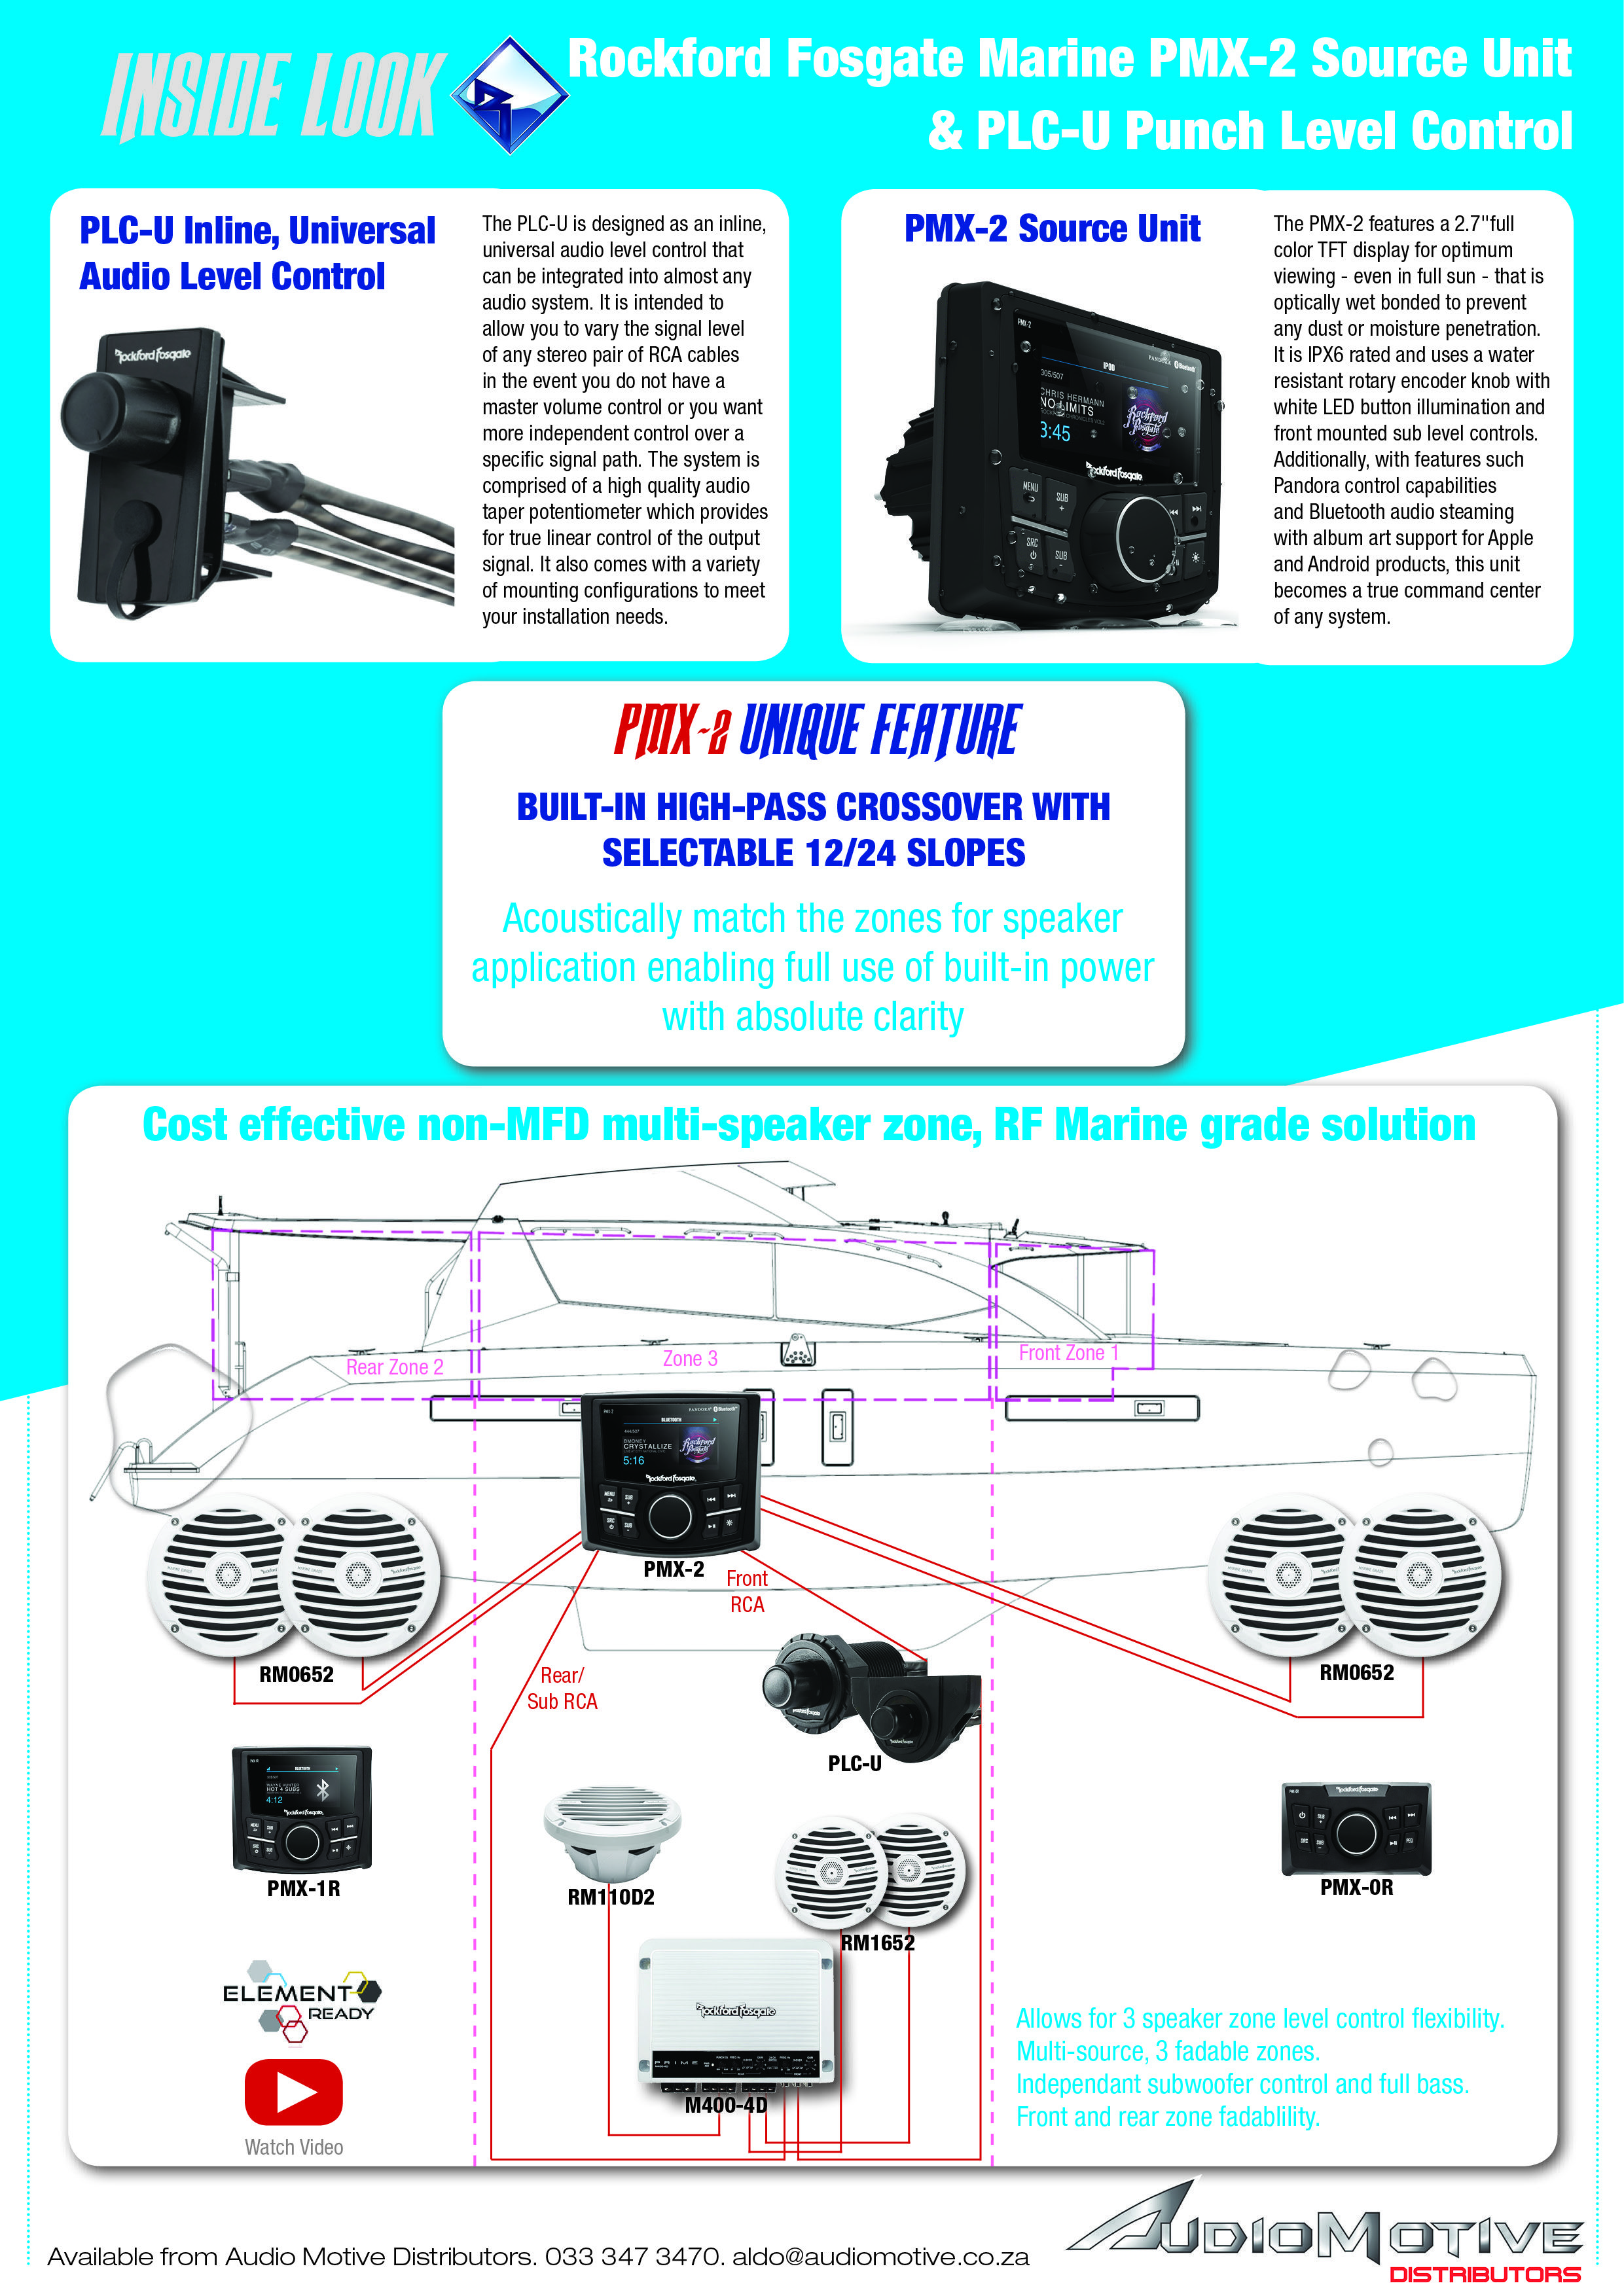 hight resolution of  marineaudio boataudio boatsound sourceunit soundforboat rockford fosgate boat sound system setup pmx 2